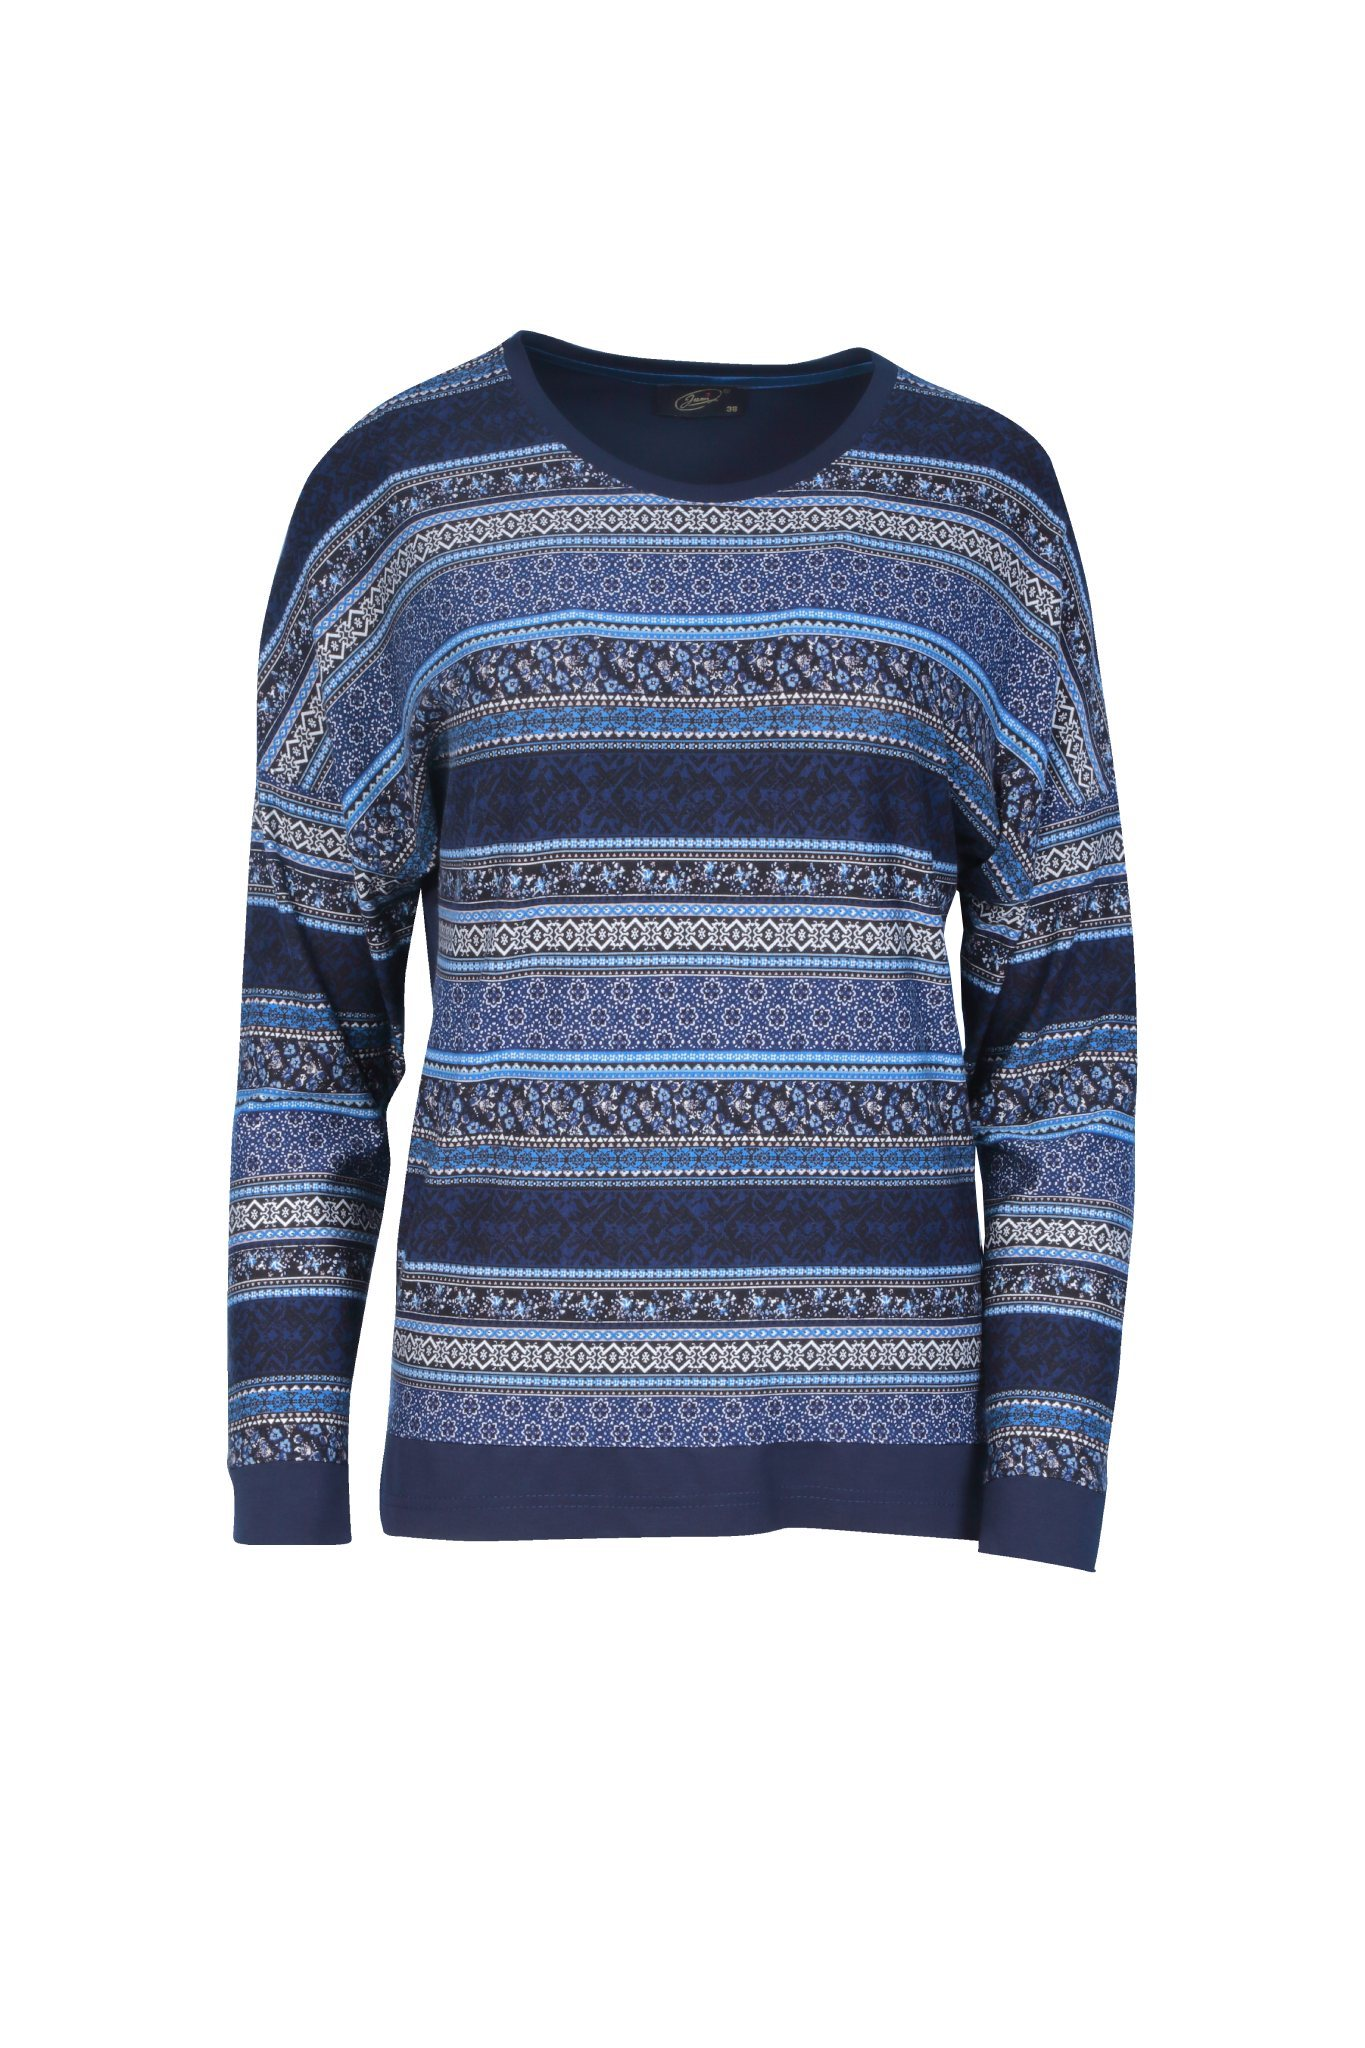 1106 Jumitex granatowo-niebieska bluzka we wzory